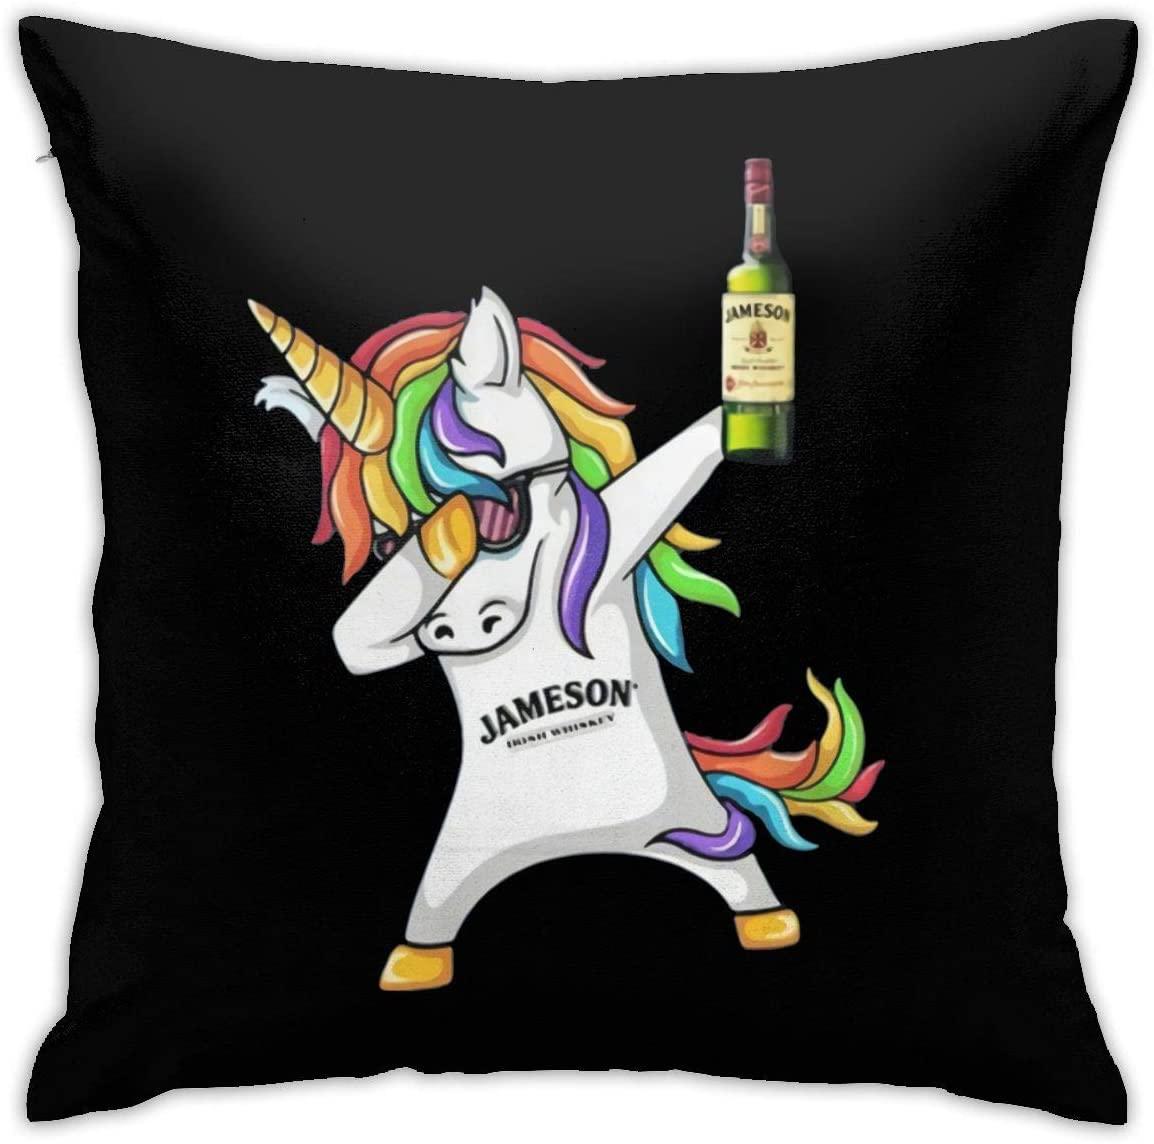 Winodfrw Unicorn Dabbing Jameson Irish Whiskey Pillowcase Throw Pillow Covers 18 X 18 Inch/45 X 45 cm Double-Sided Printing